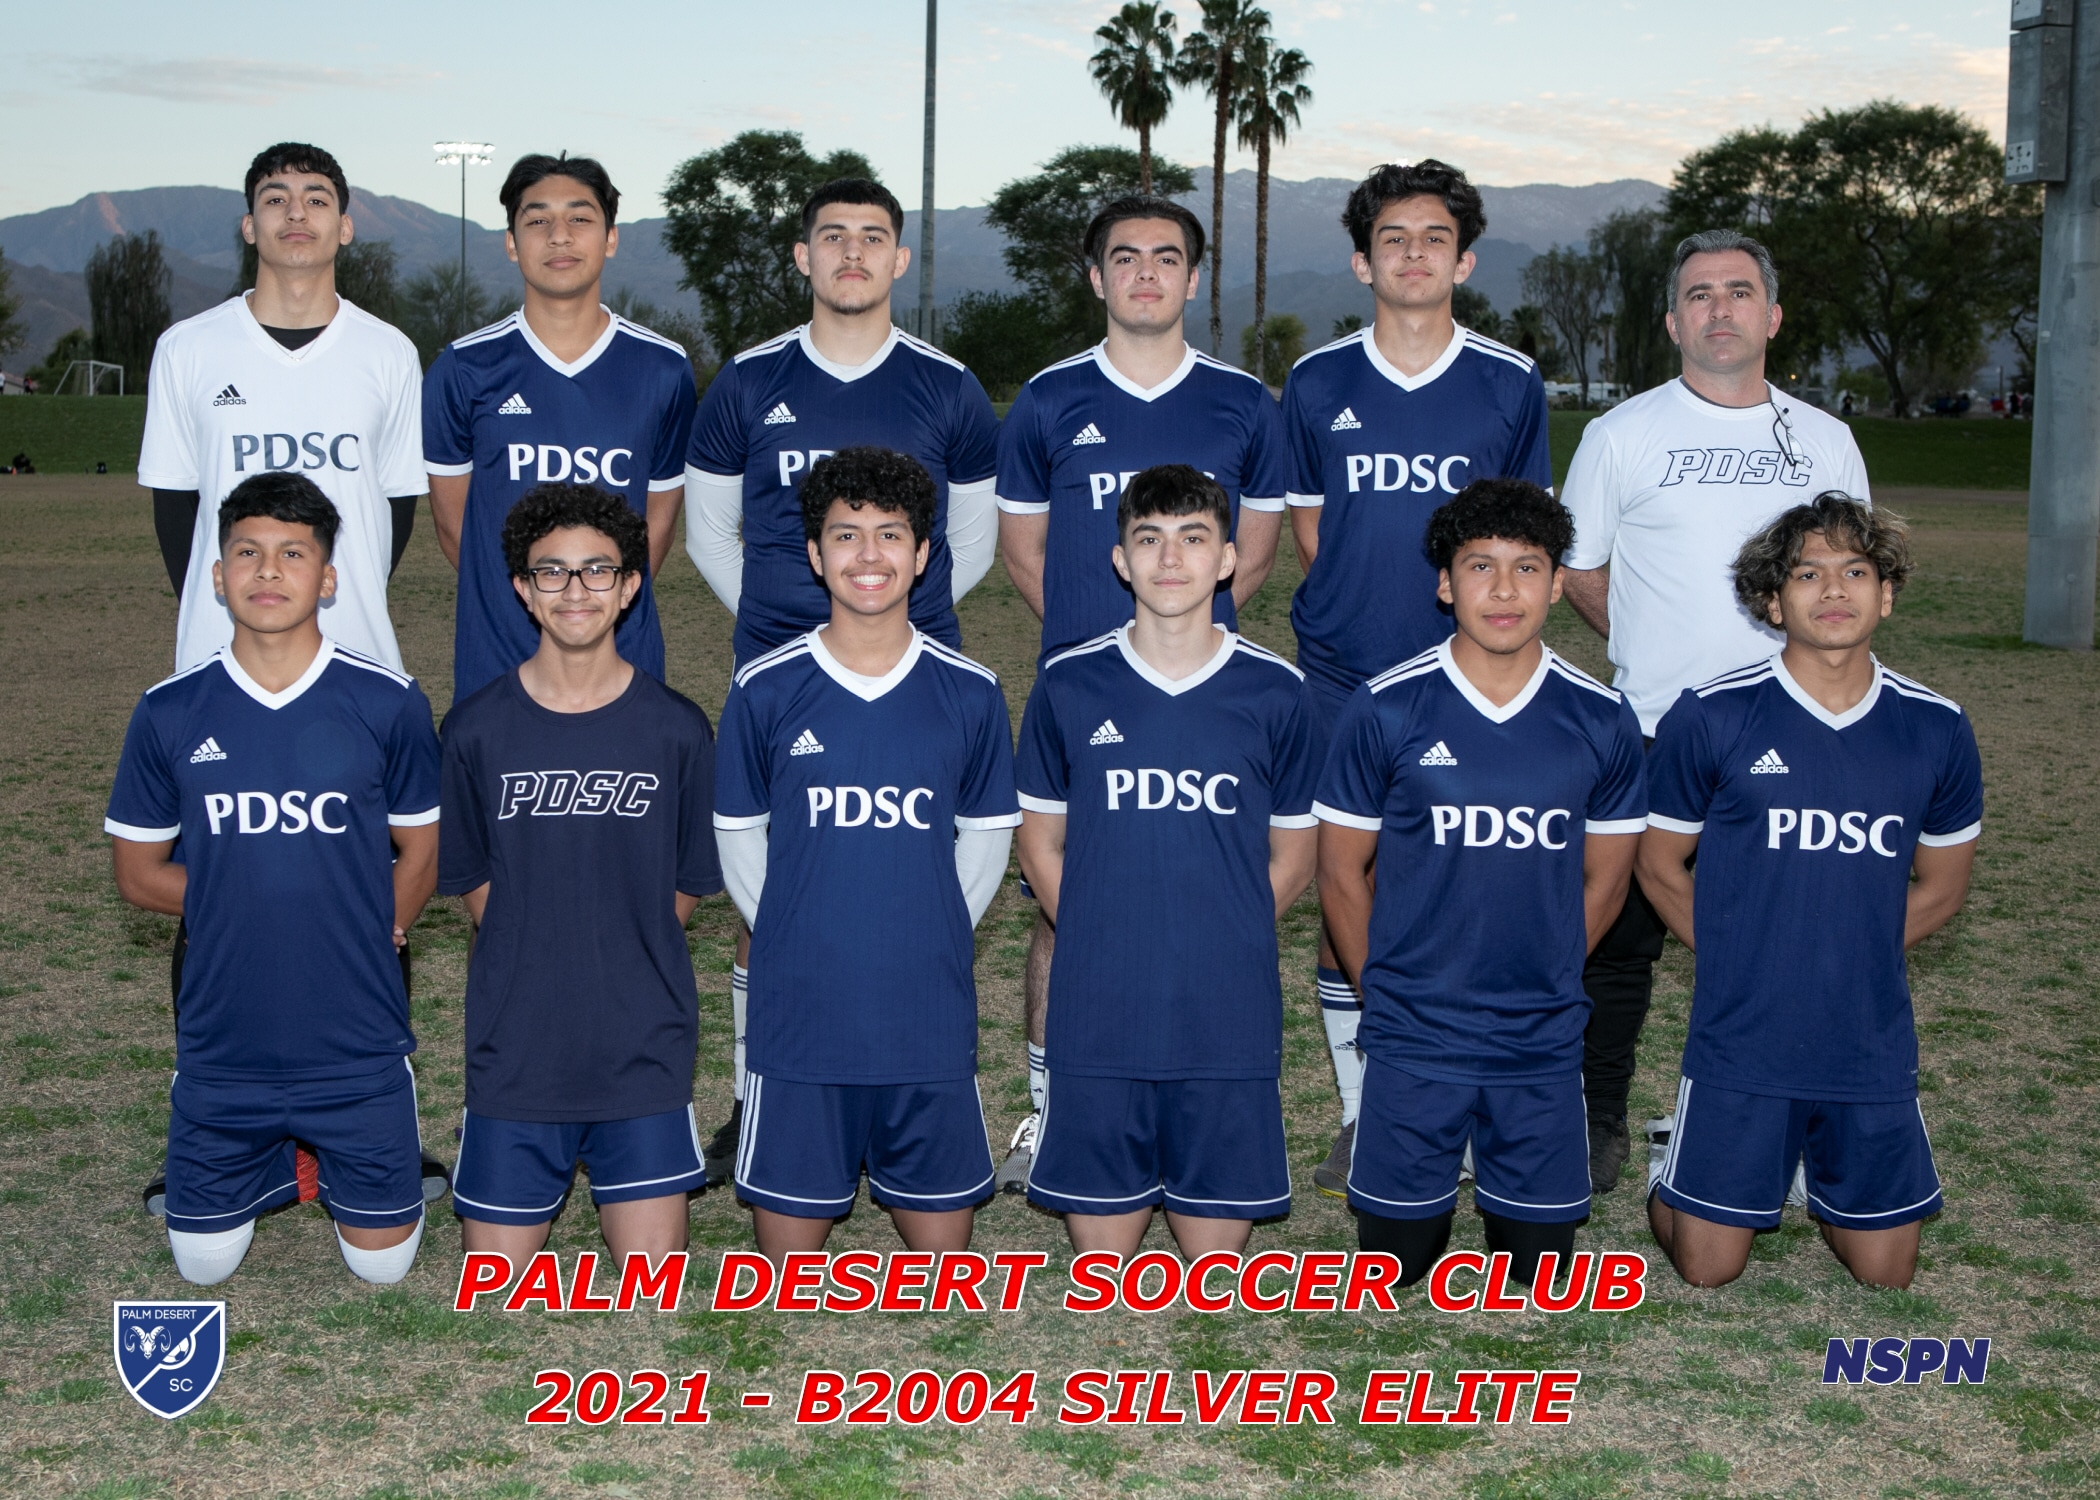 Palm Desert Soccer Club B2004 Silver Elite